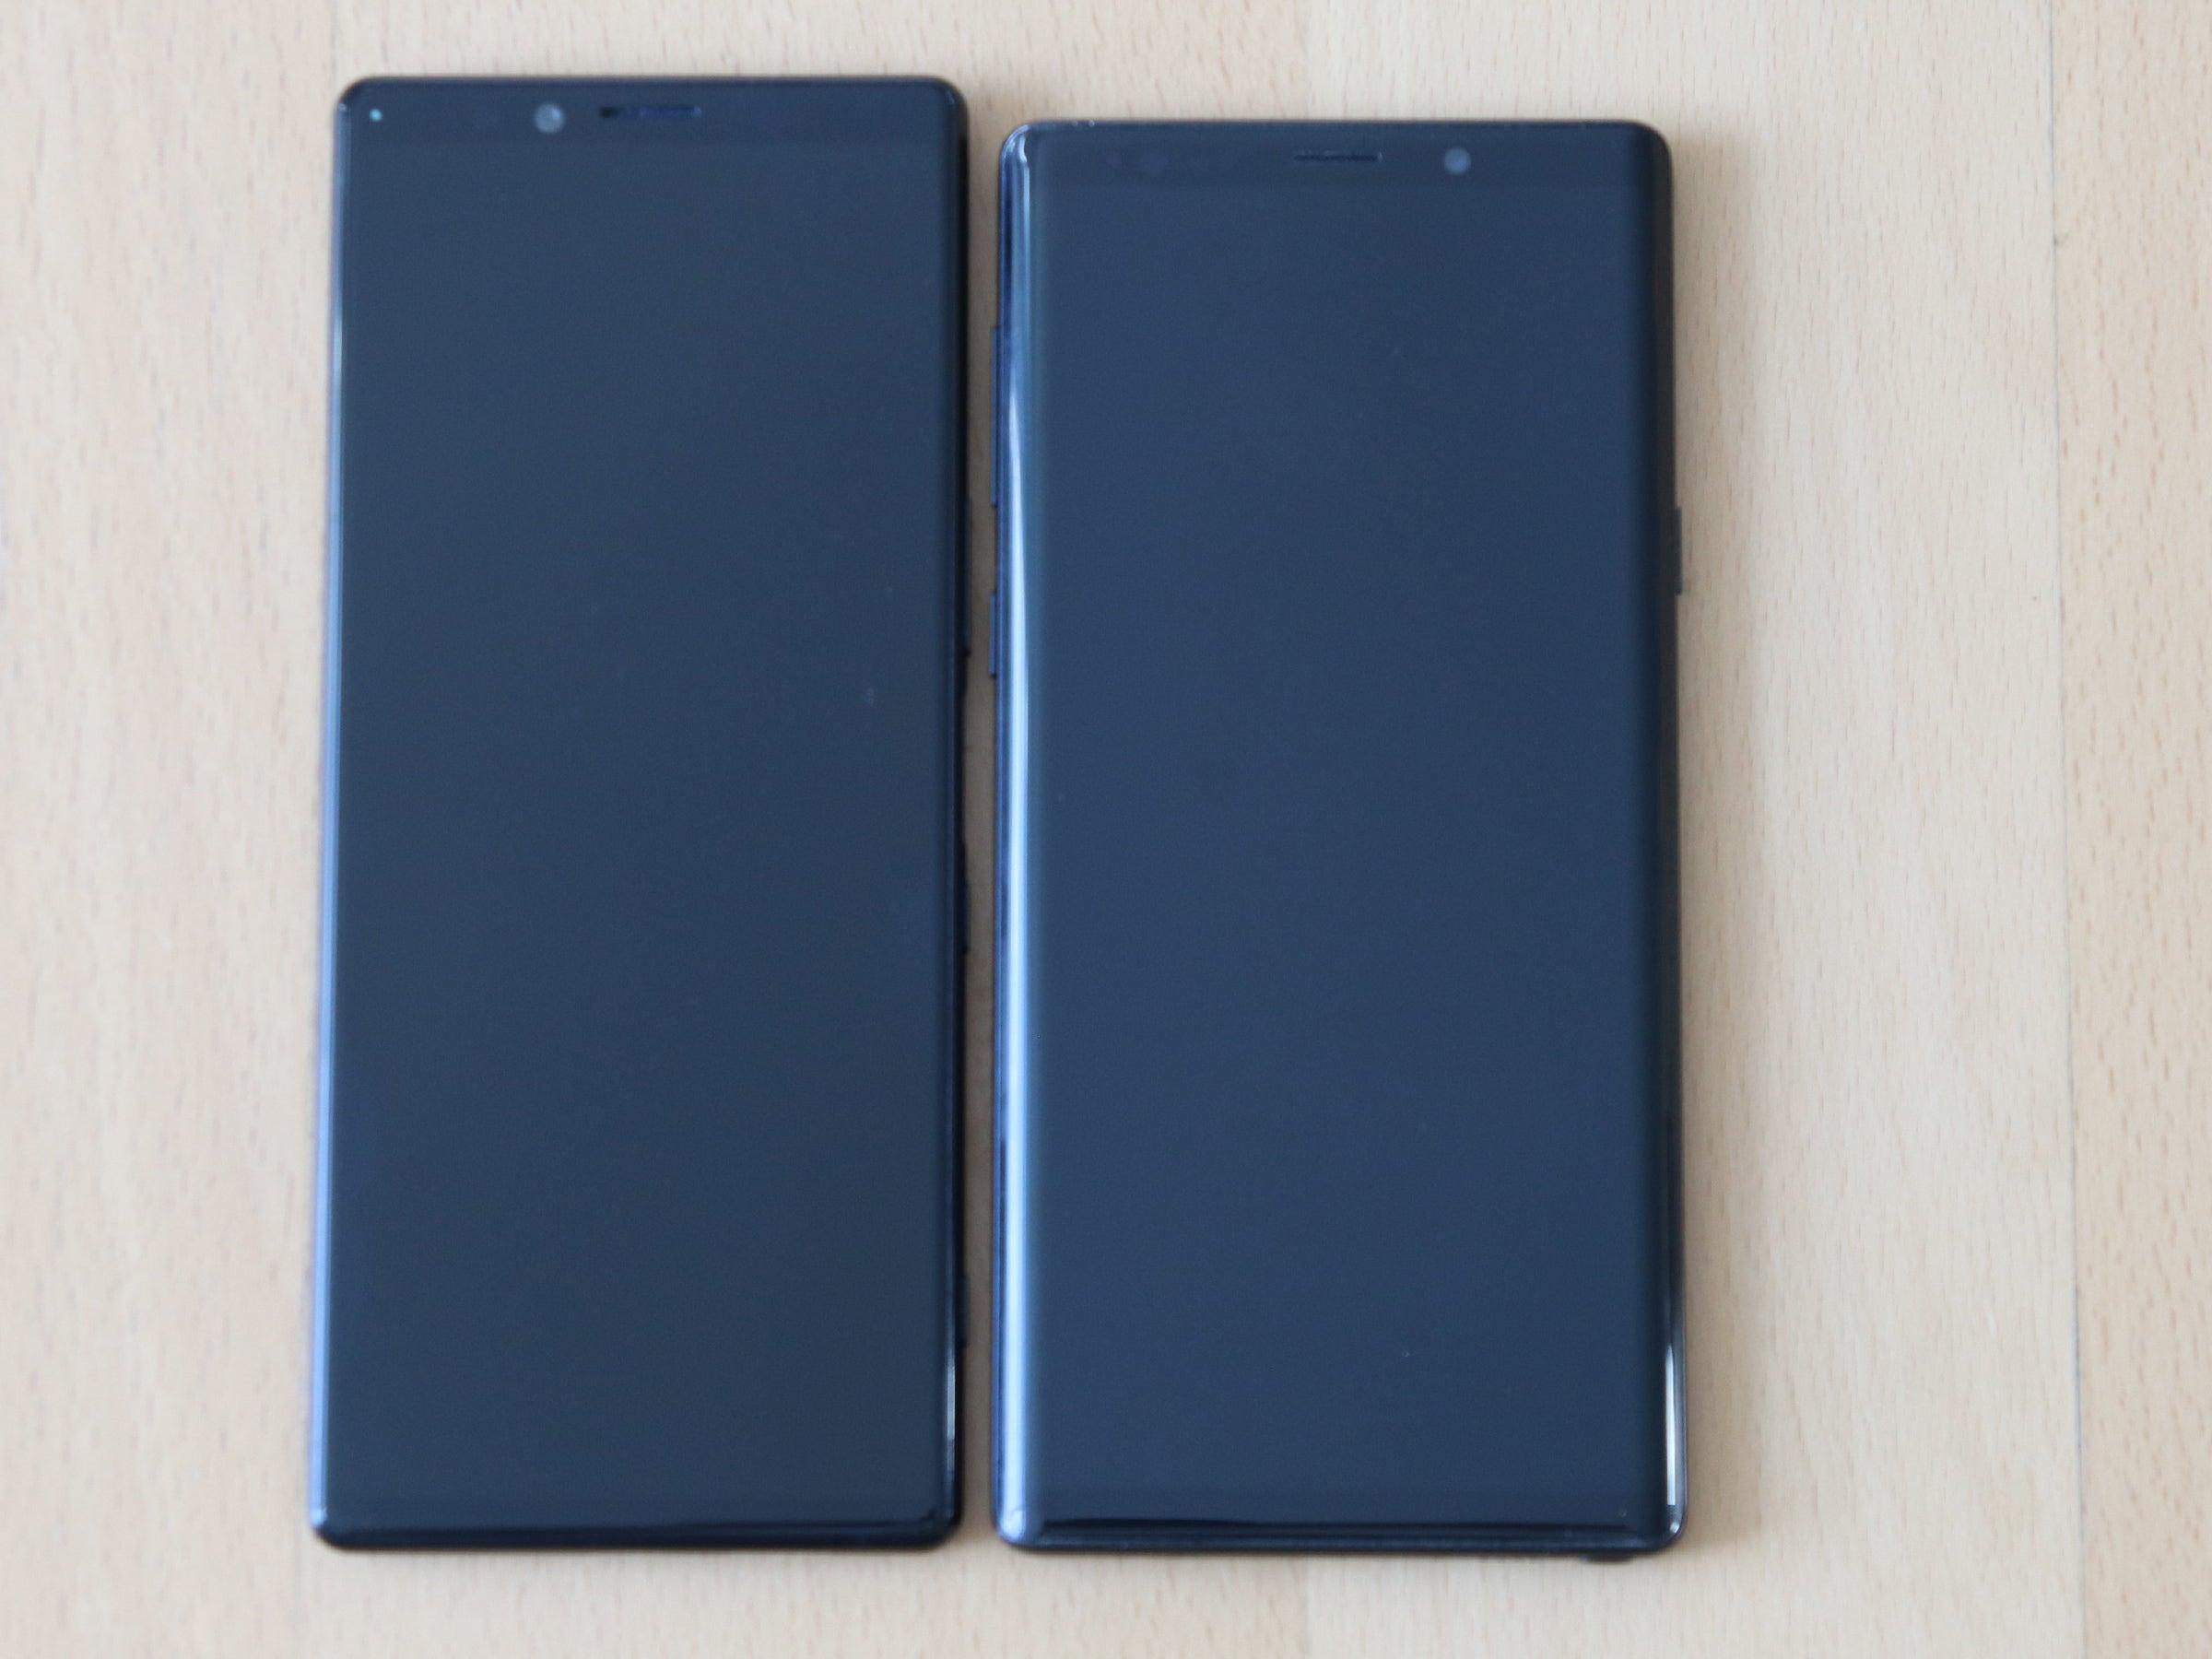 Sony Xperia 1 neben Samsung Galaxy Note 9